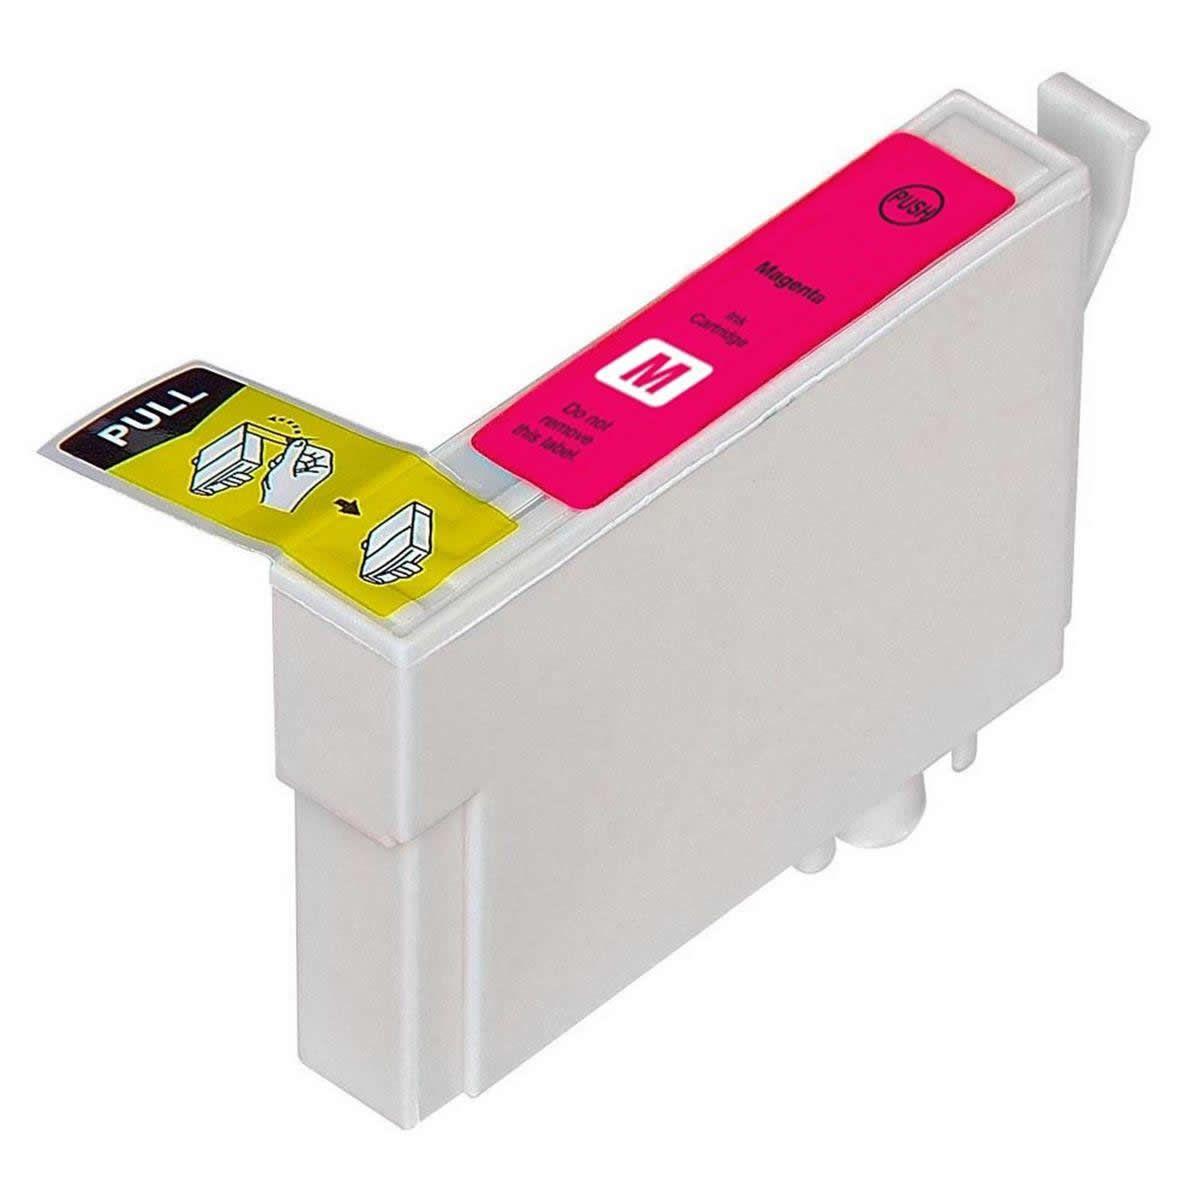 Cartucho TO483 Magenta Compatível para Epson R200 R220 R300 R320 R340 R500 R600 RX500 RX600 RX620 RX640